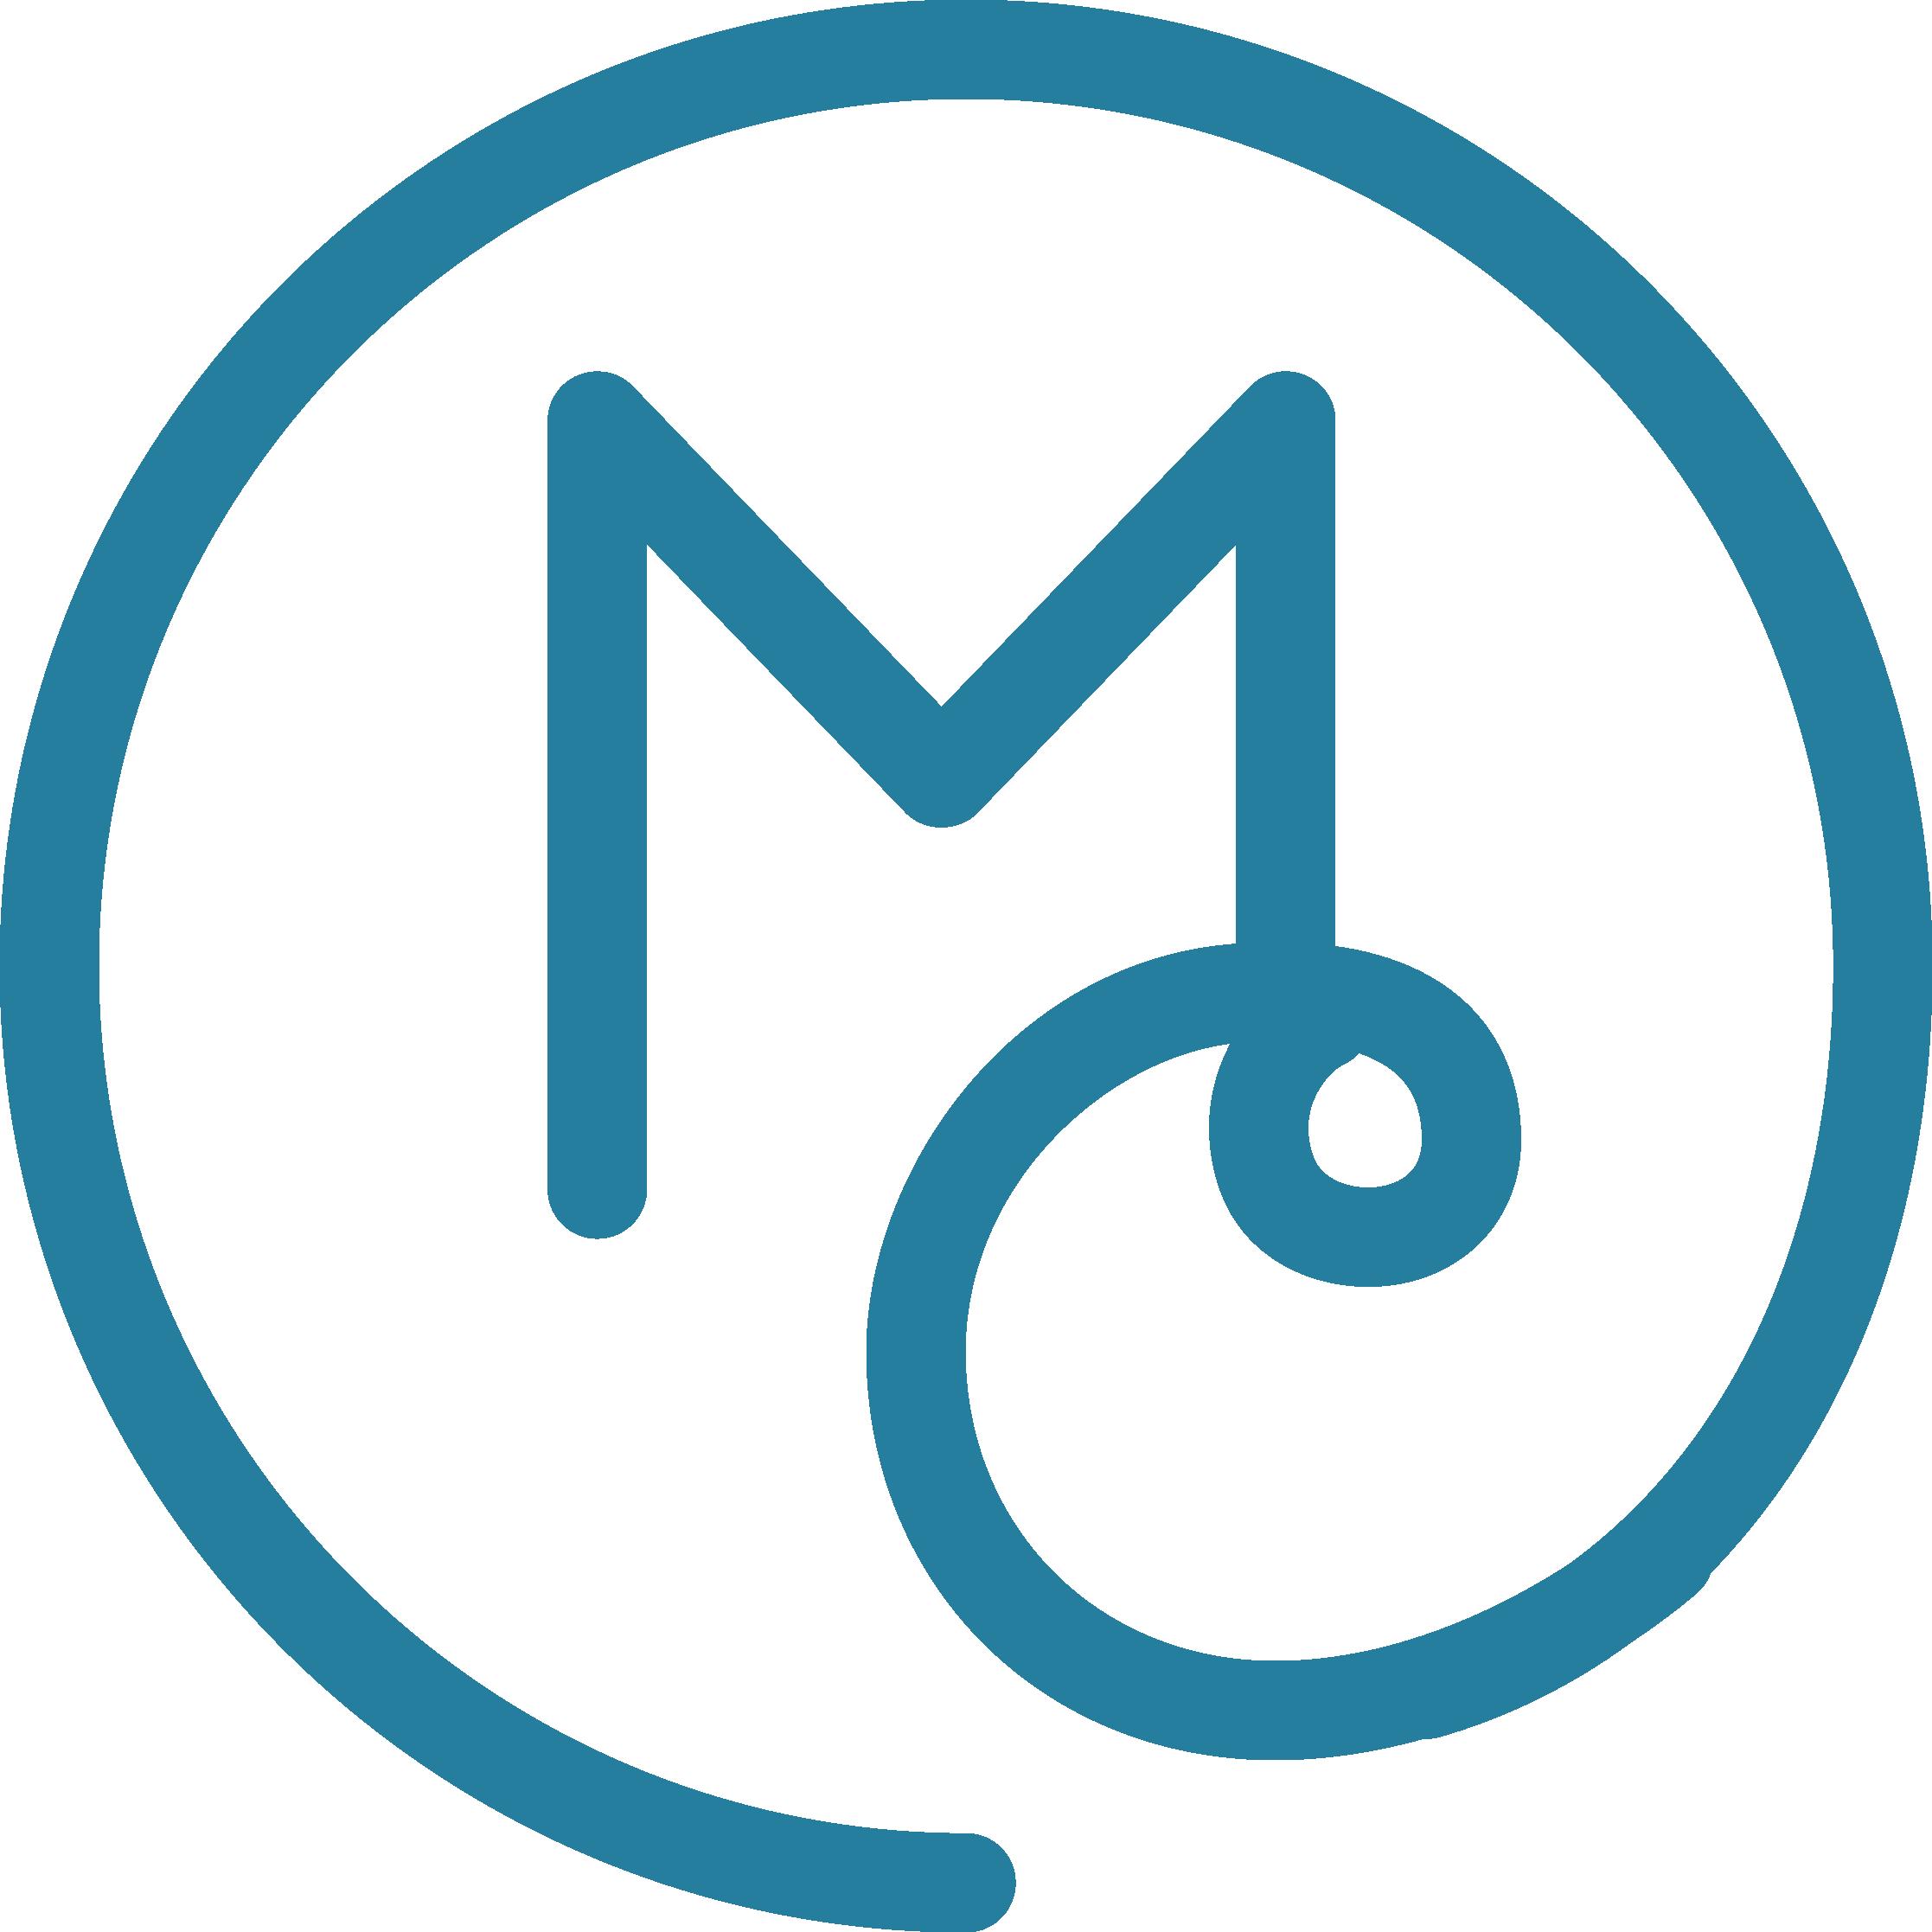 Mc brdmrk 01 blue